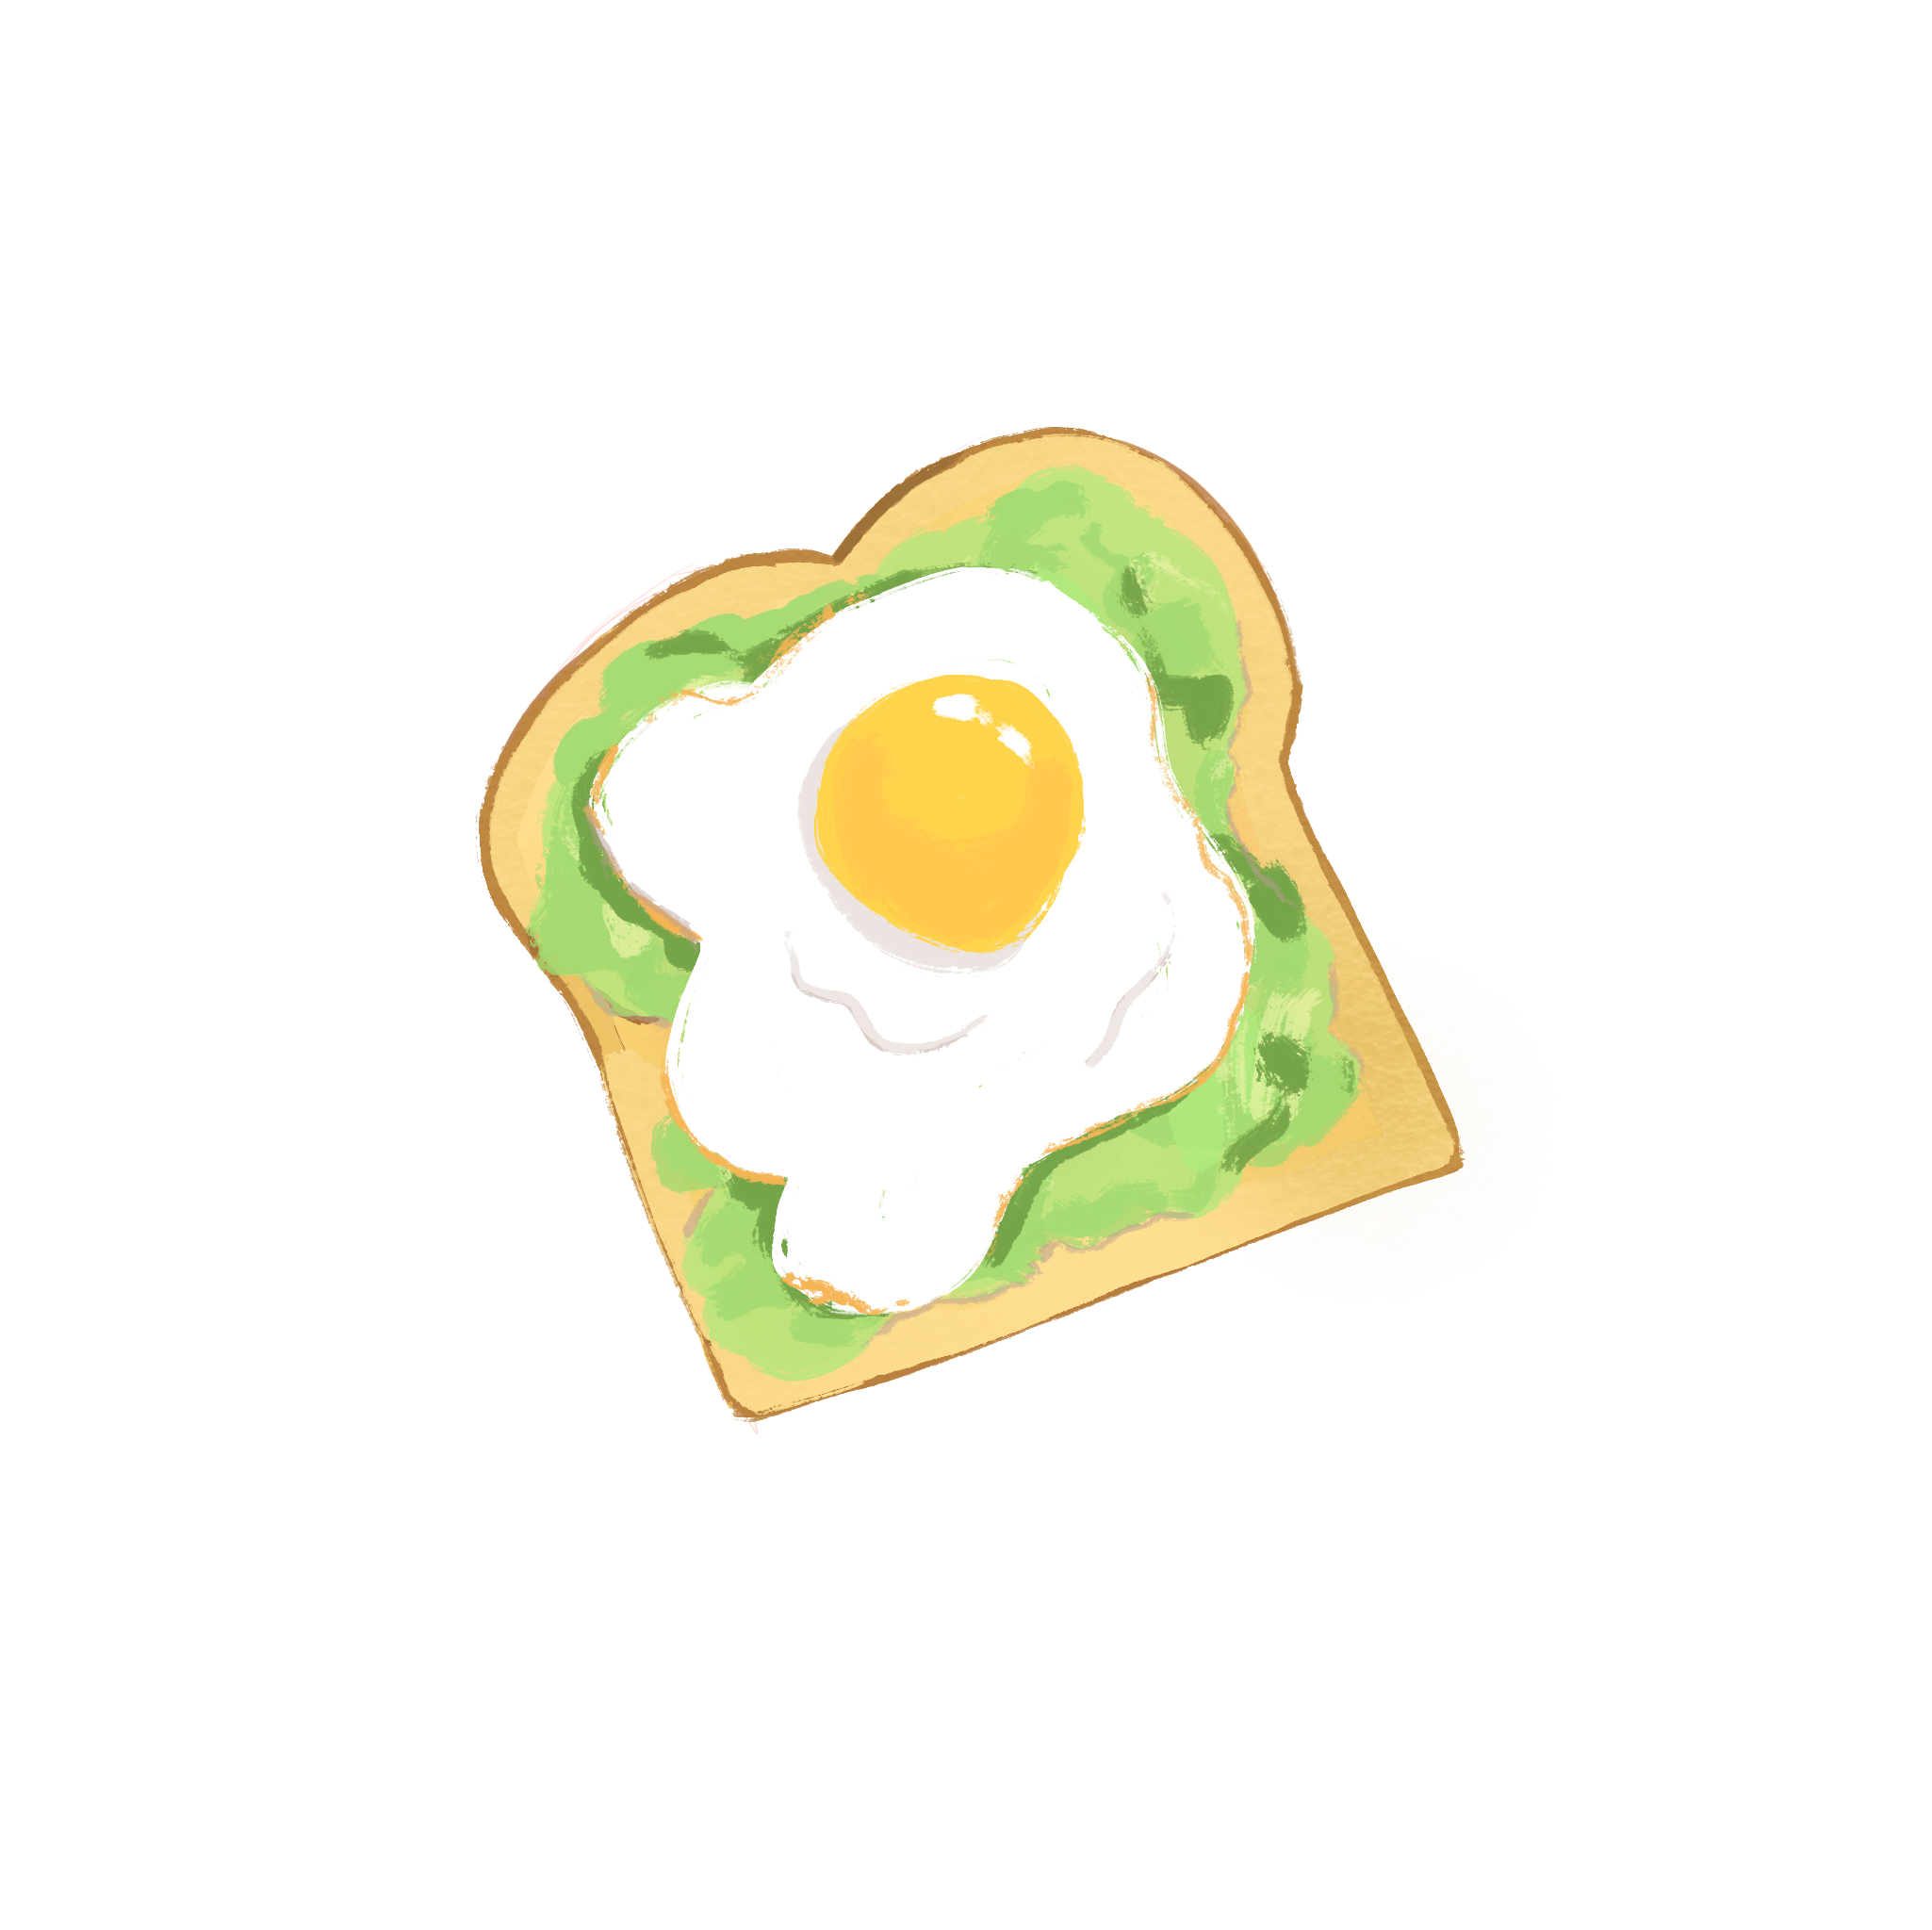 Avocado Toast Sticker By Szdesignss In 2021 Cute Cartoon Wallpapers Cute Drawings Avocado Toast